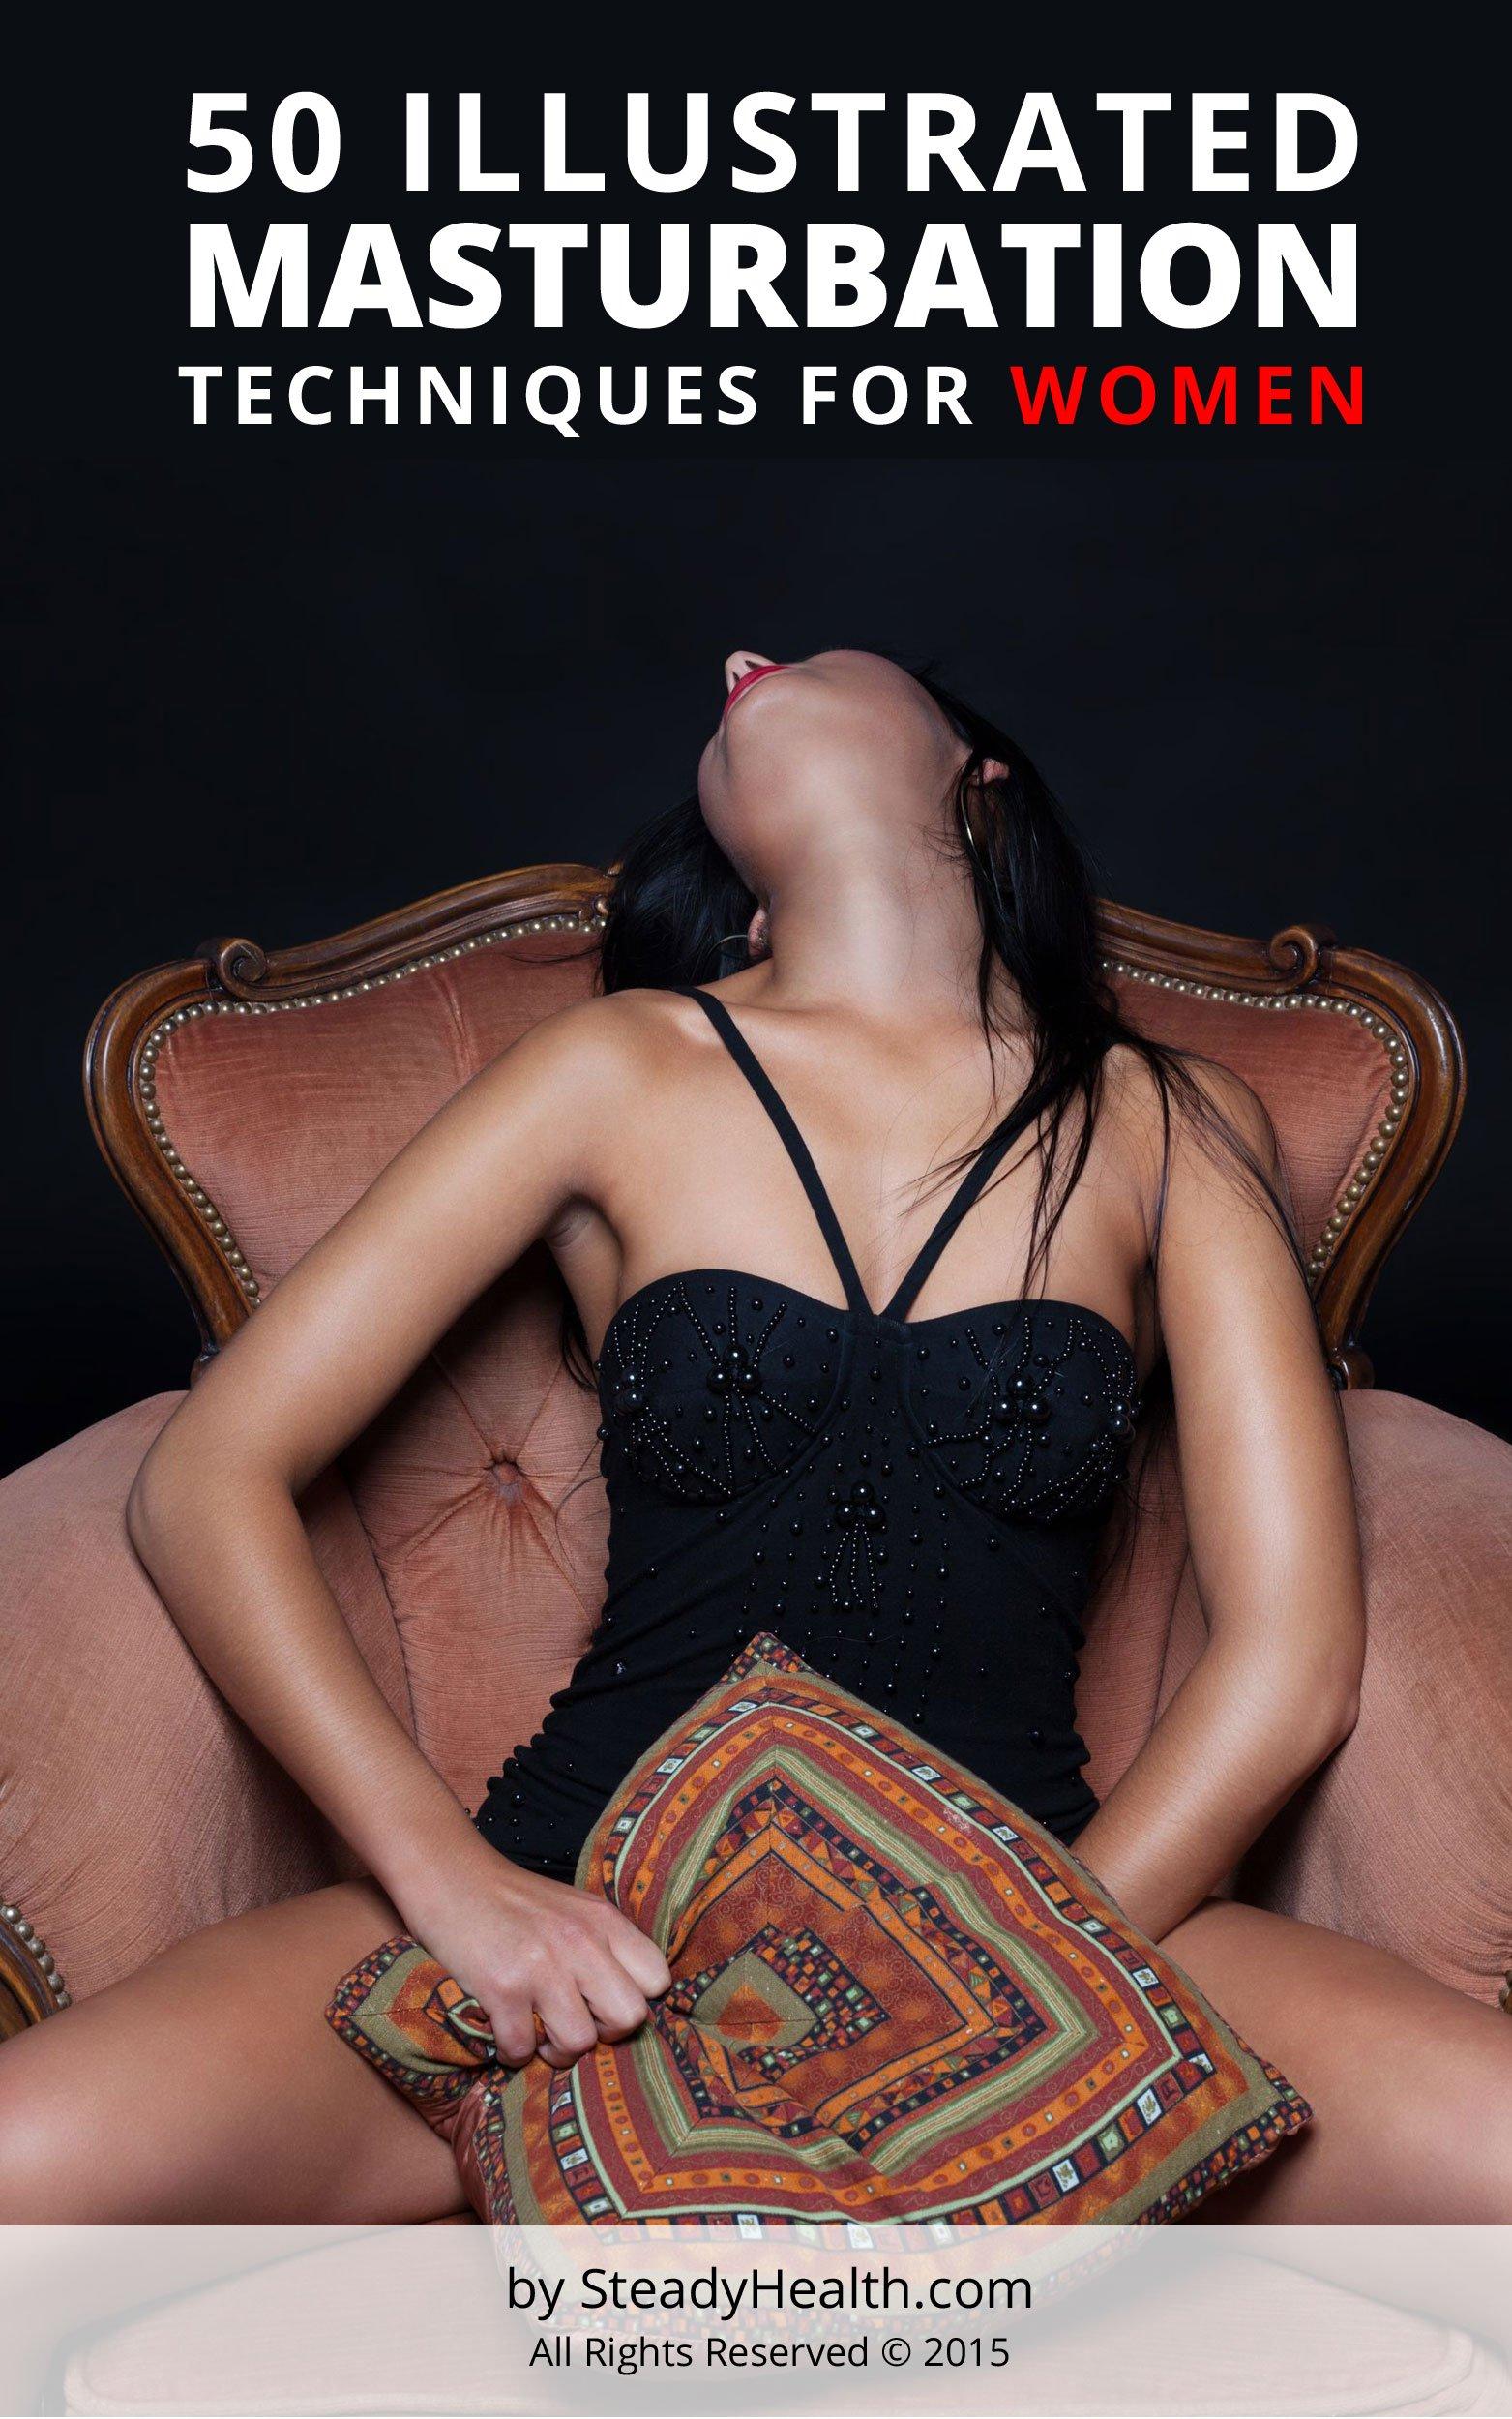 женщины мастурбируют на скрытую камеру